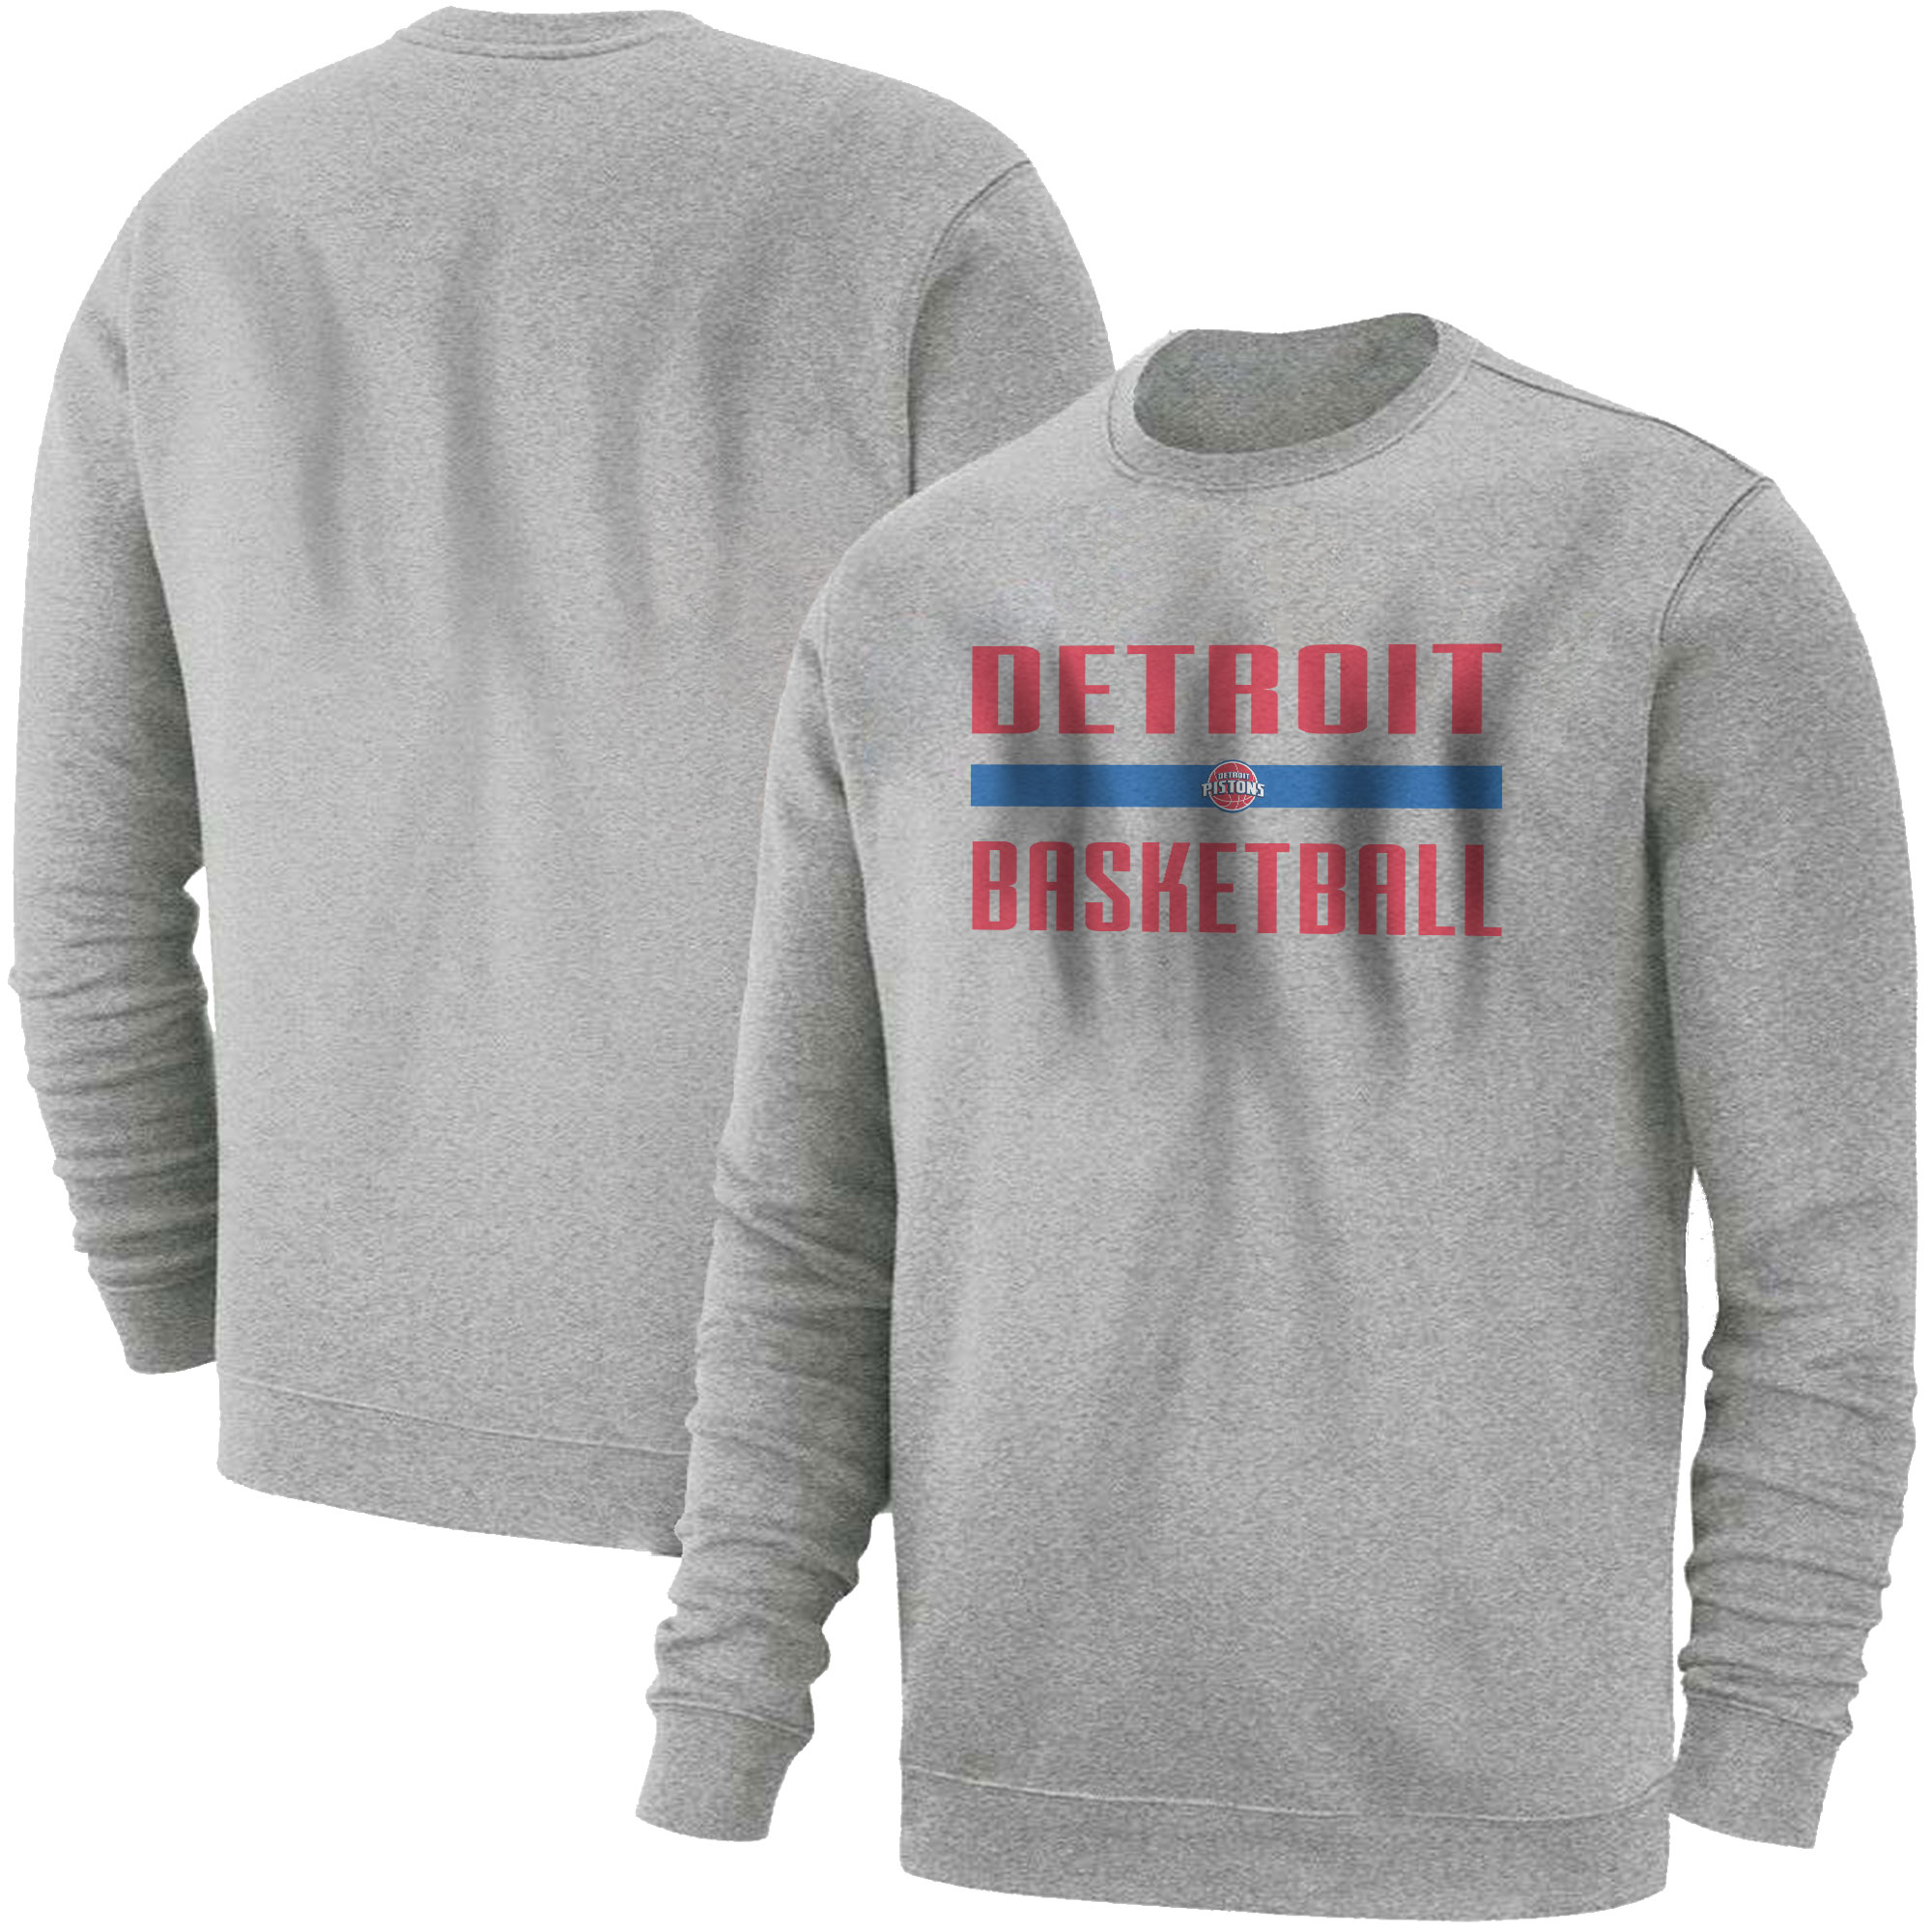 Detroit Basketball Basic (BSC-GRY-NP-detroit-bsktbll-510)